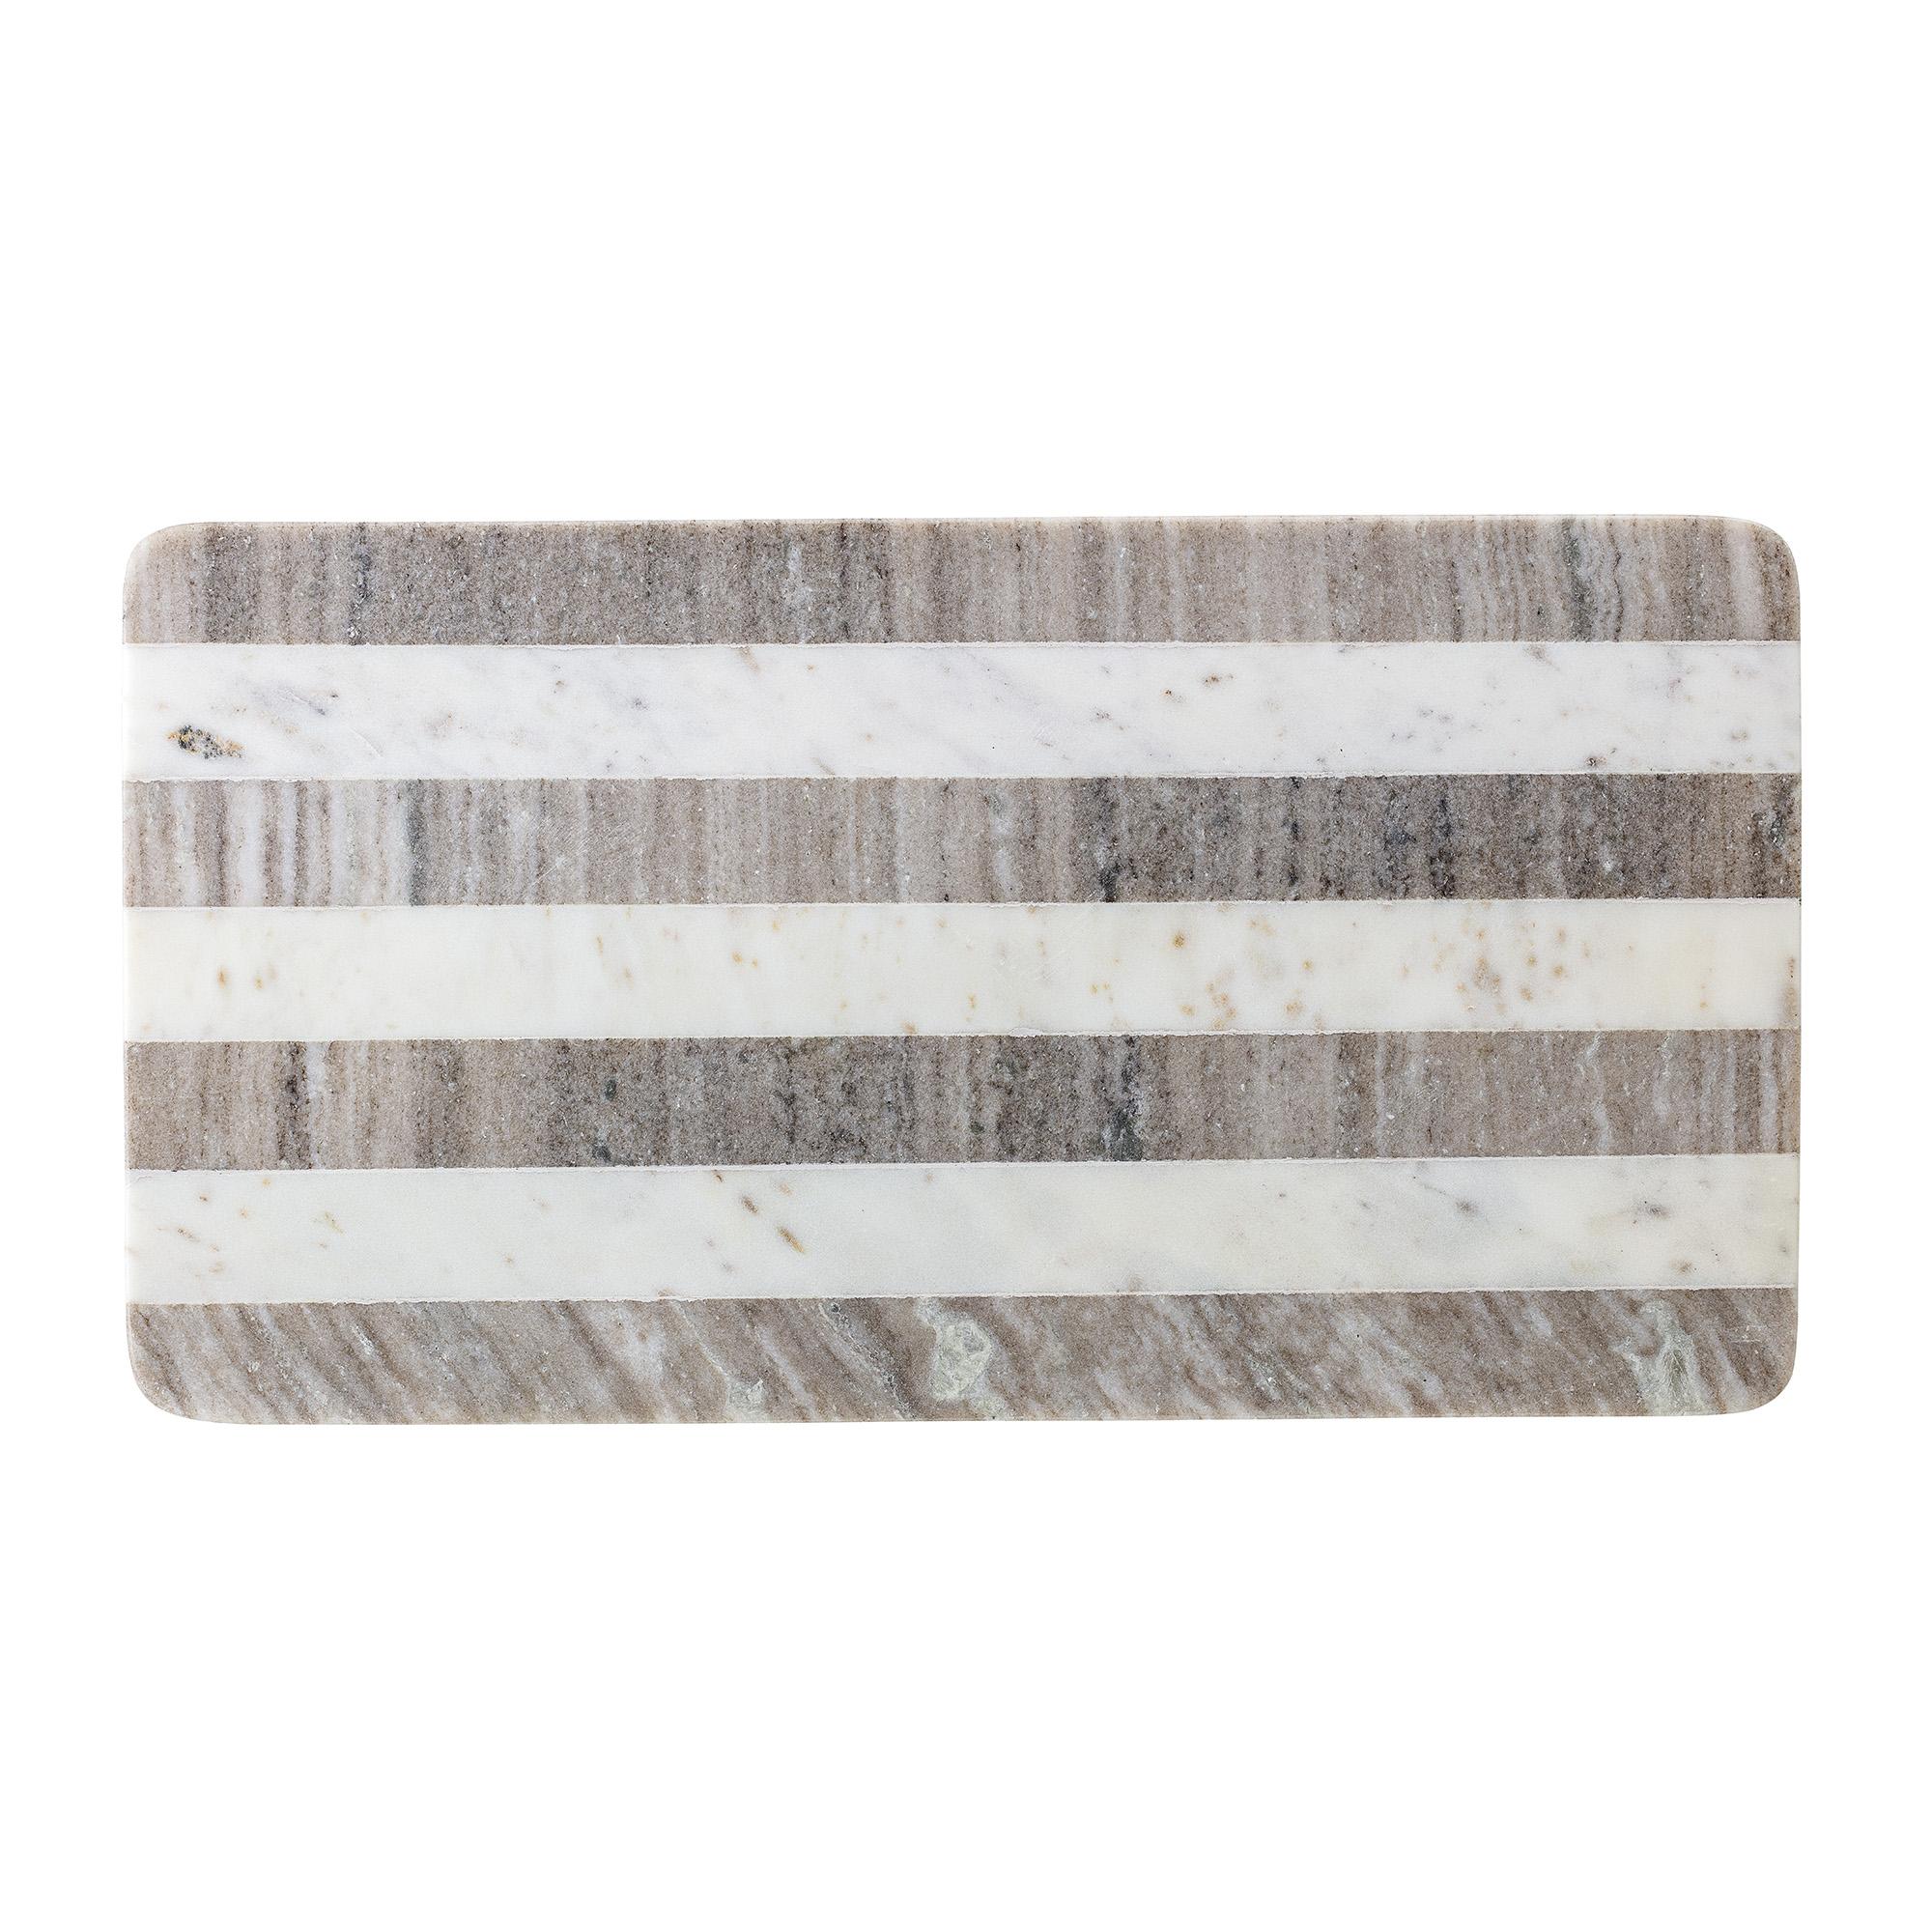 Serveringsbräda Marmor/Trä 52×28 cm